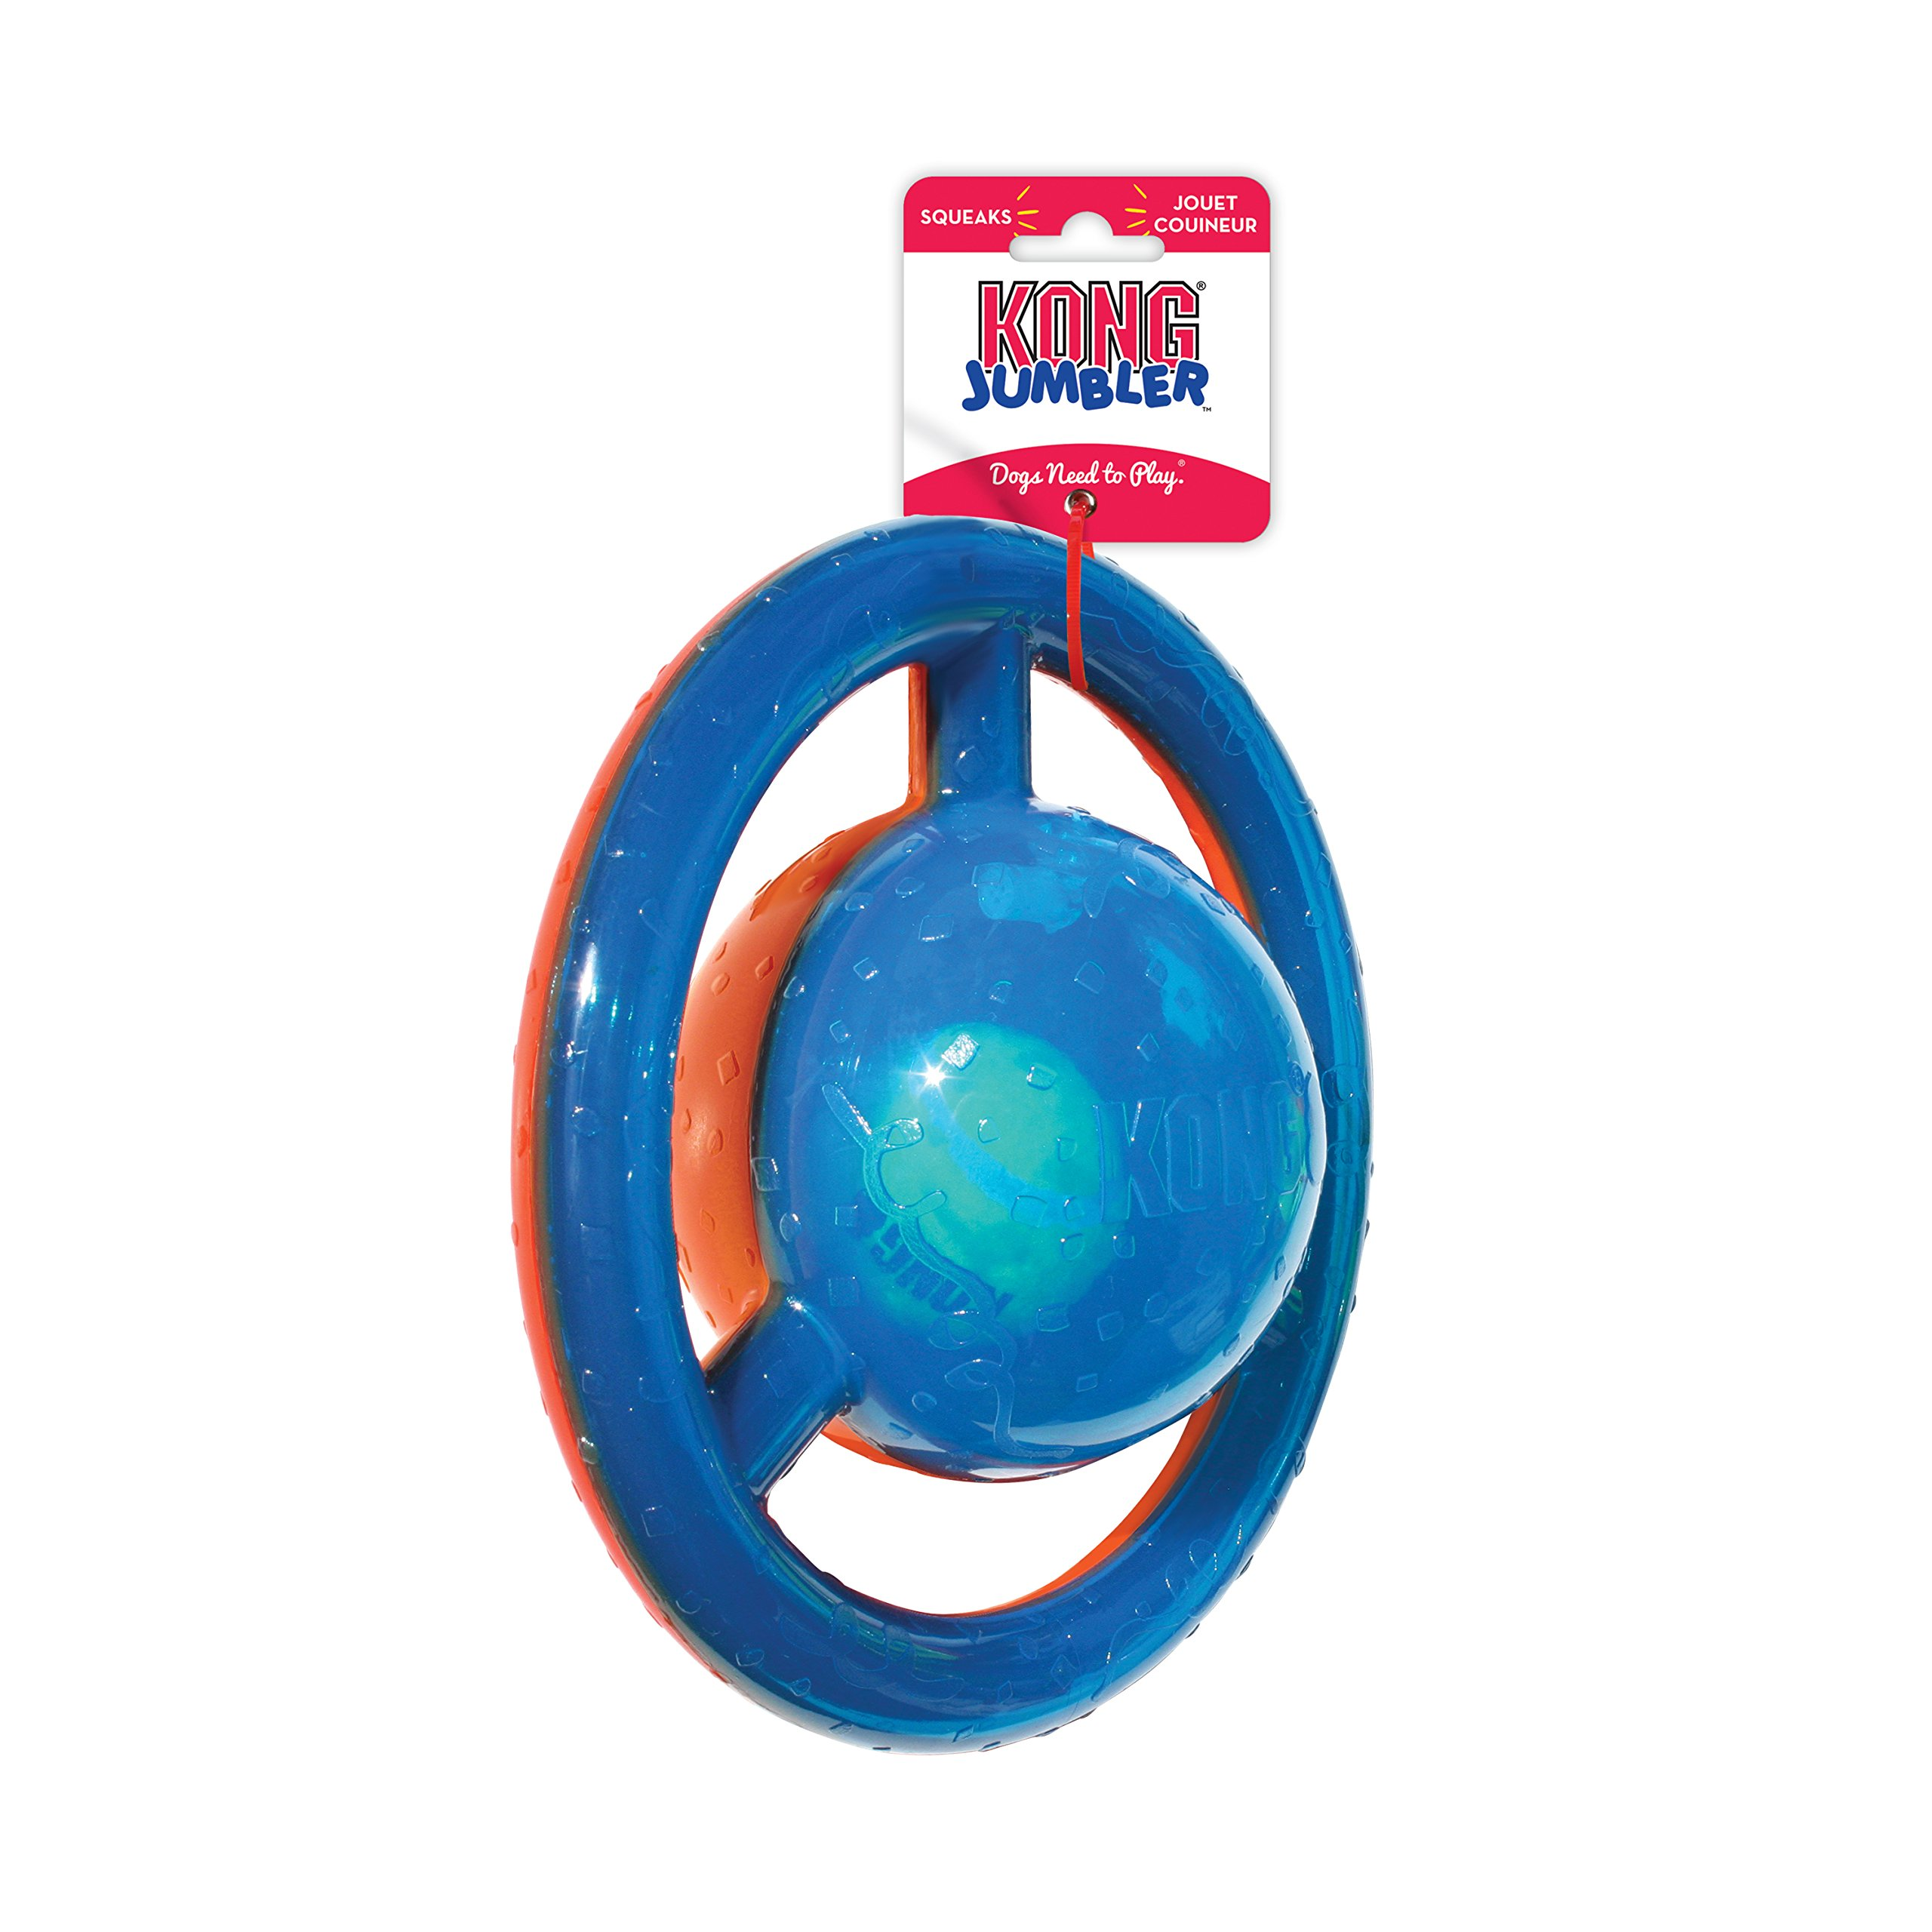 KONG Jumbler Disc Dog Toy, Medium/Large by KONG (Image #3)